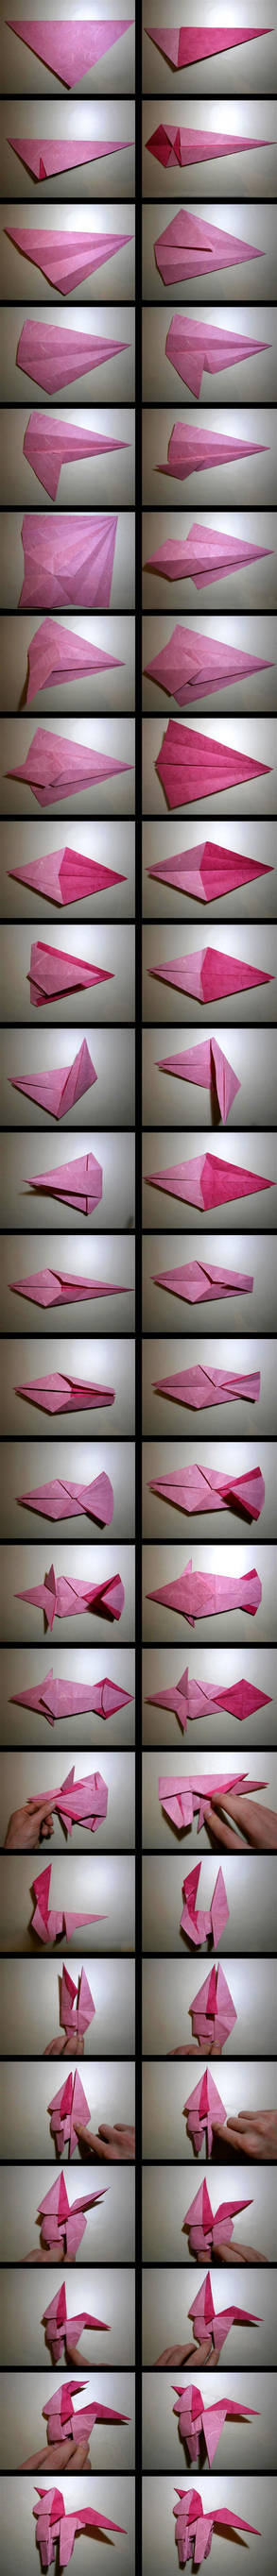 Pinkie Pie Origami Folding Process